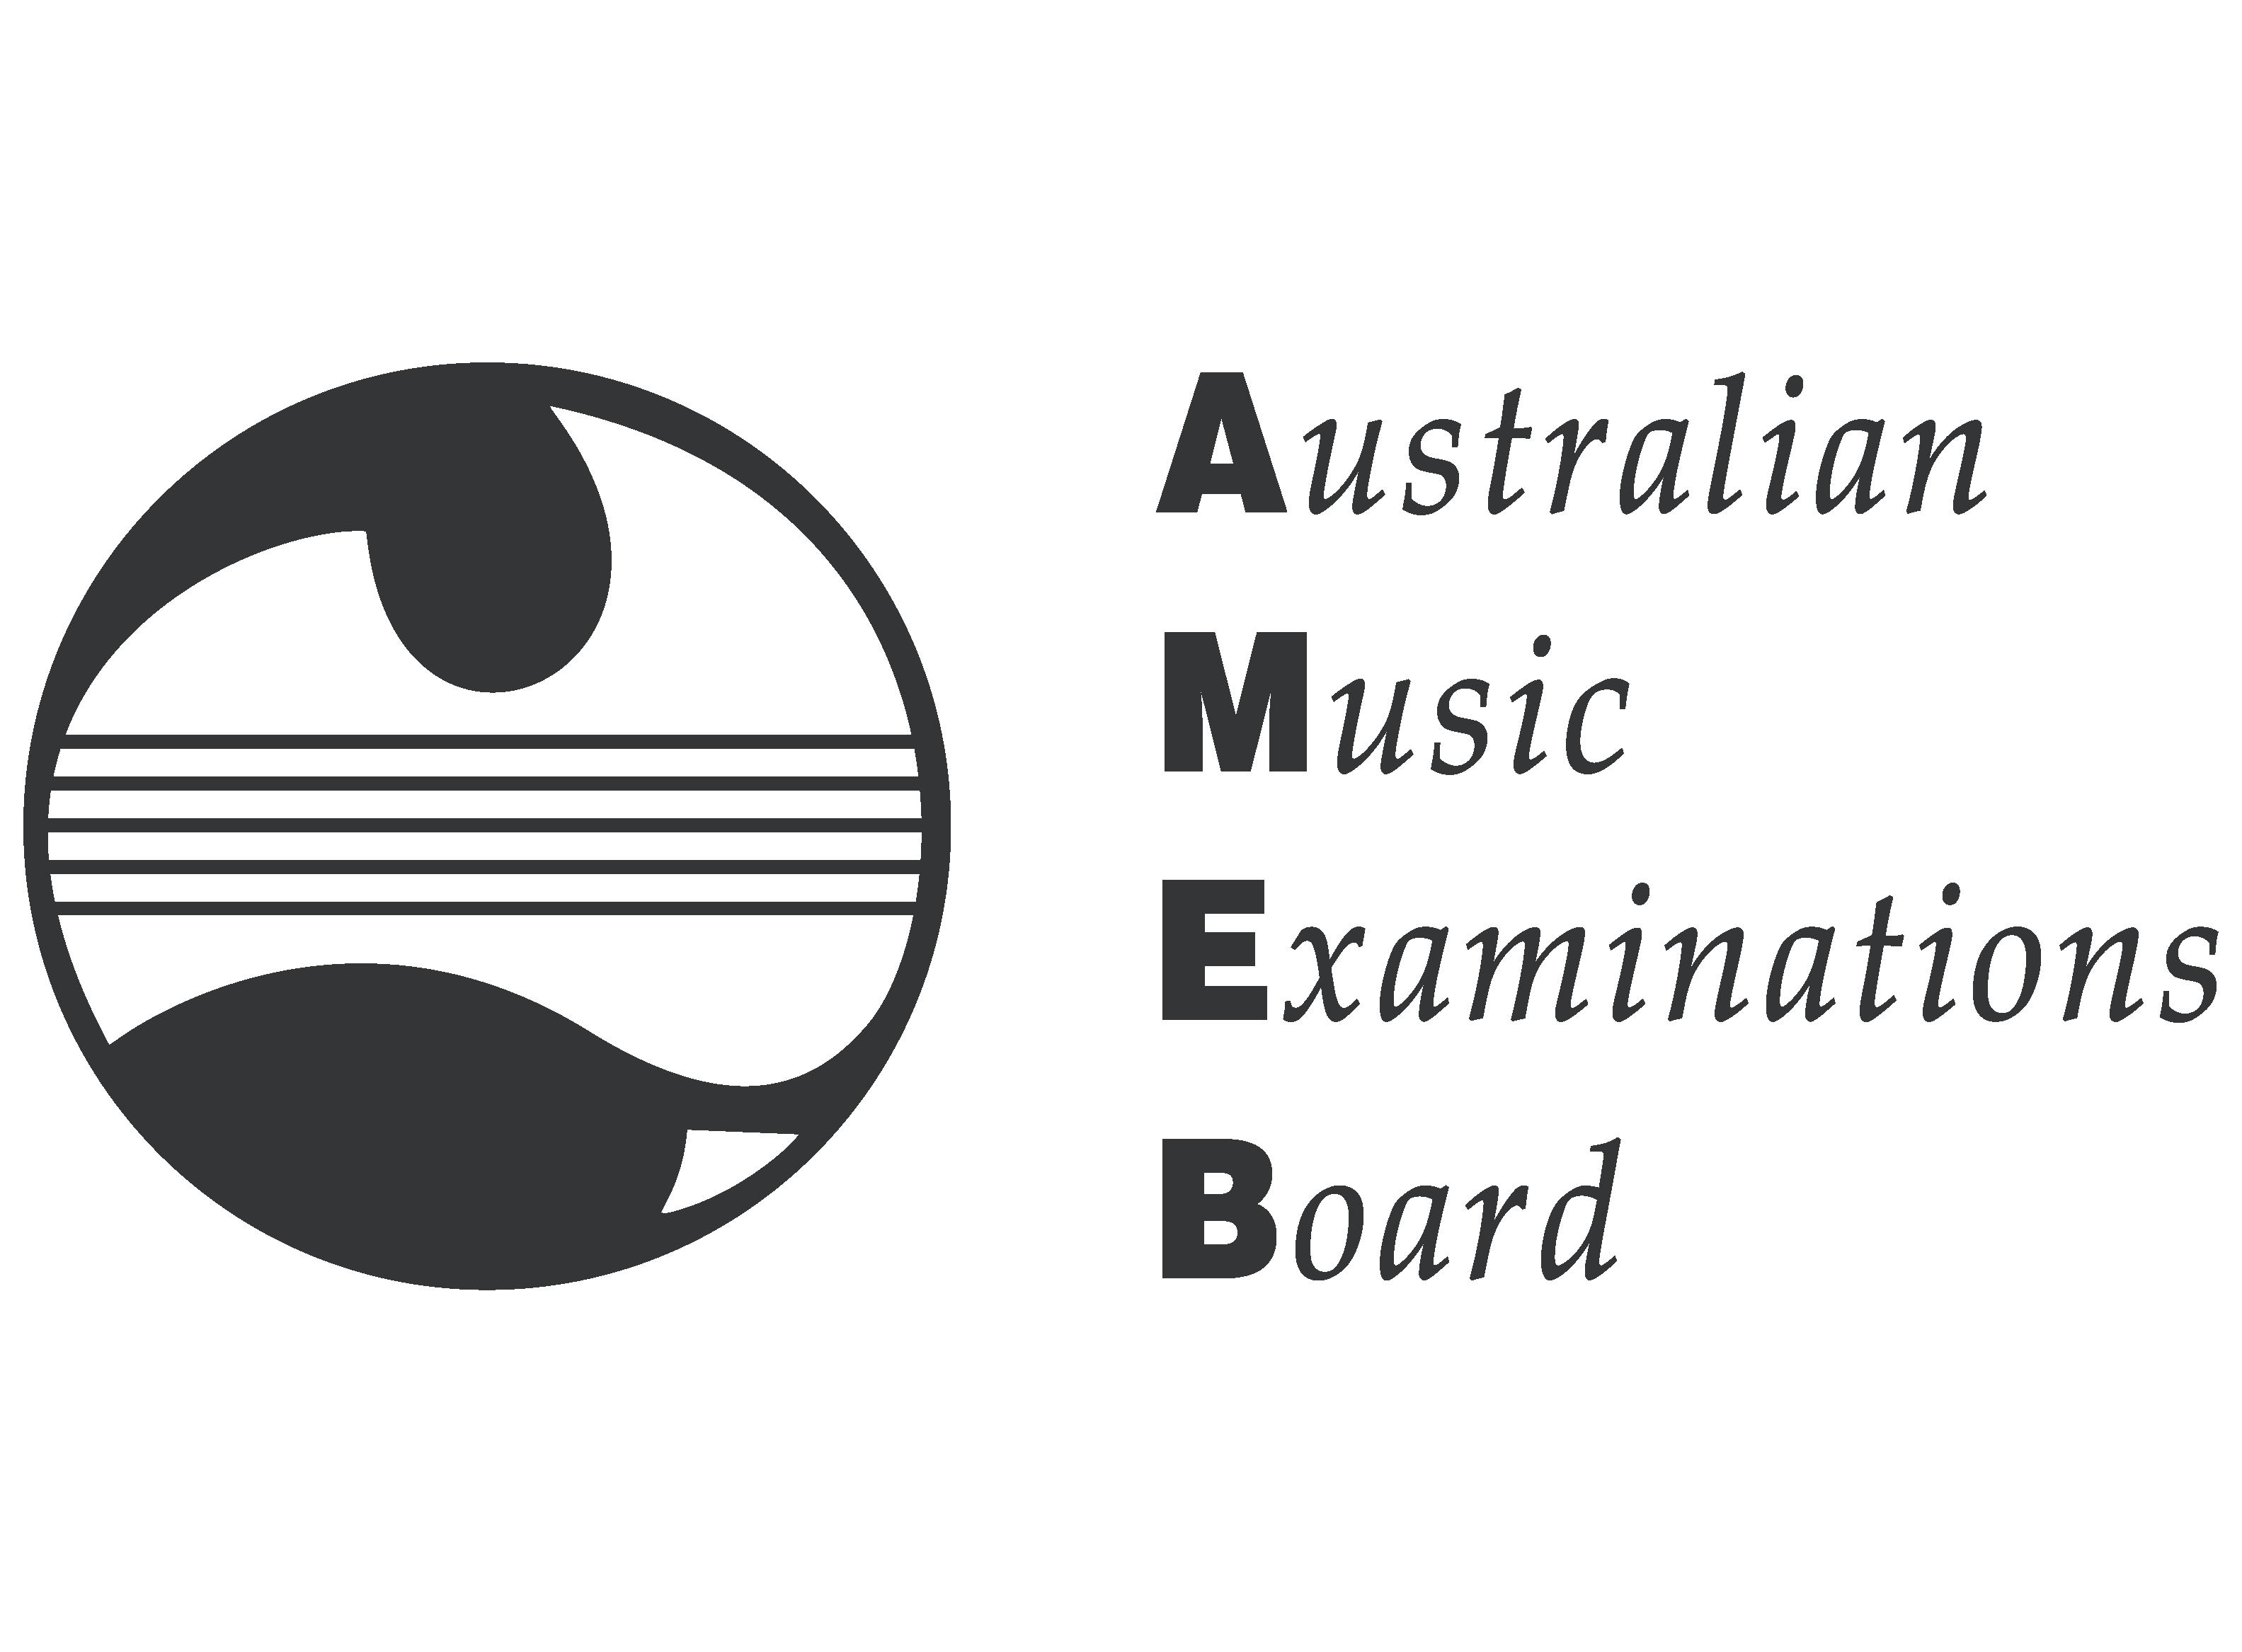 Australian Music Examinations Board (AMEB)